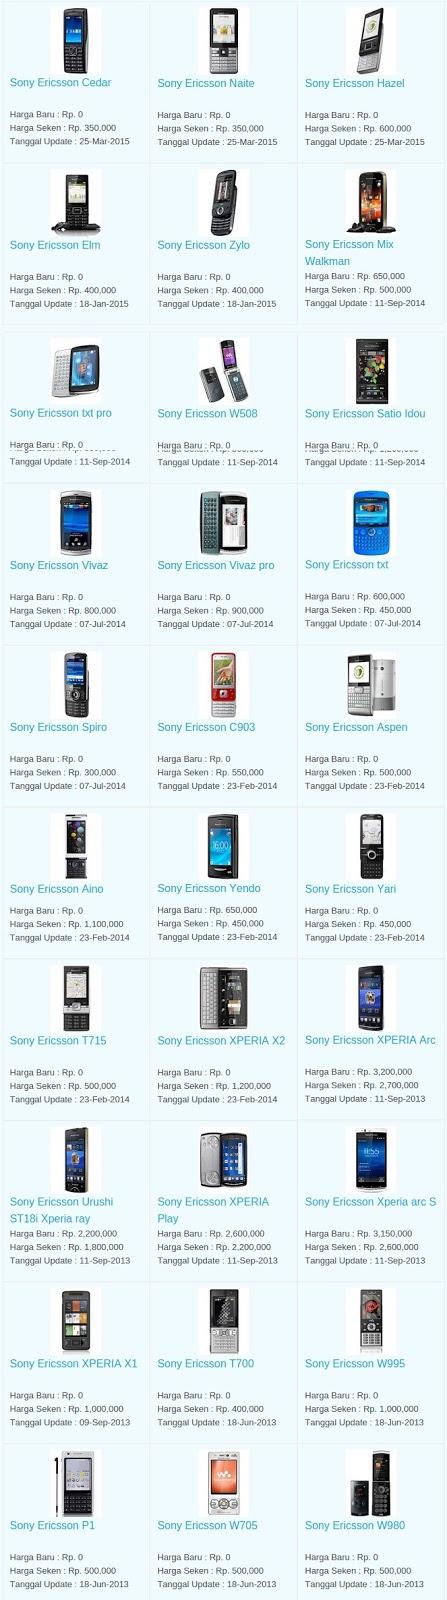 Daftar Harga Hp Sony Ericsson Januari 2016